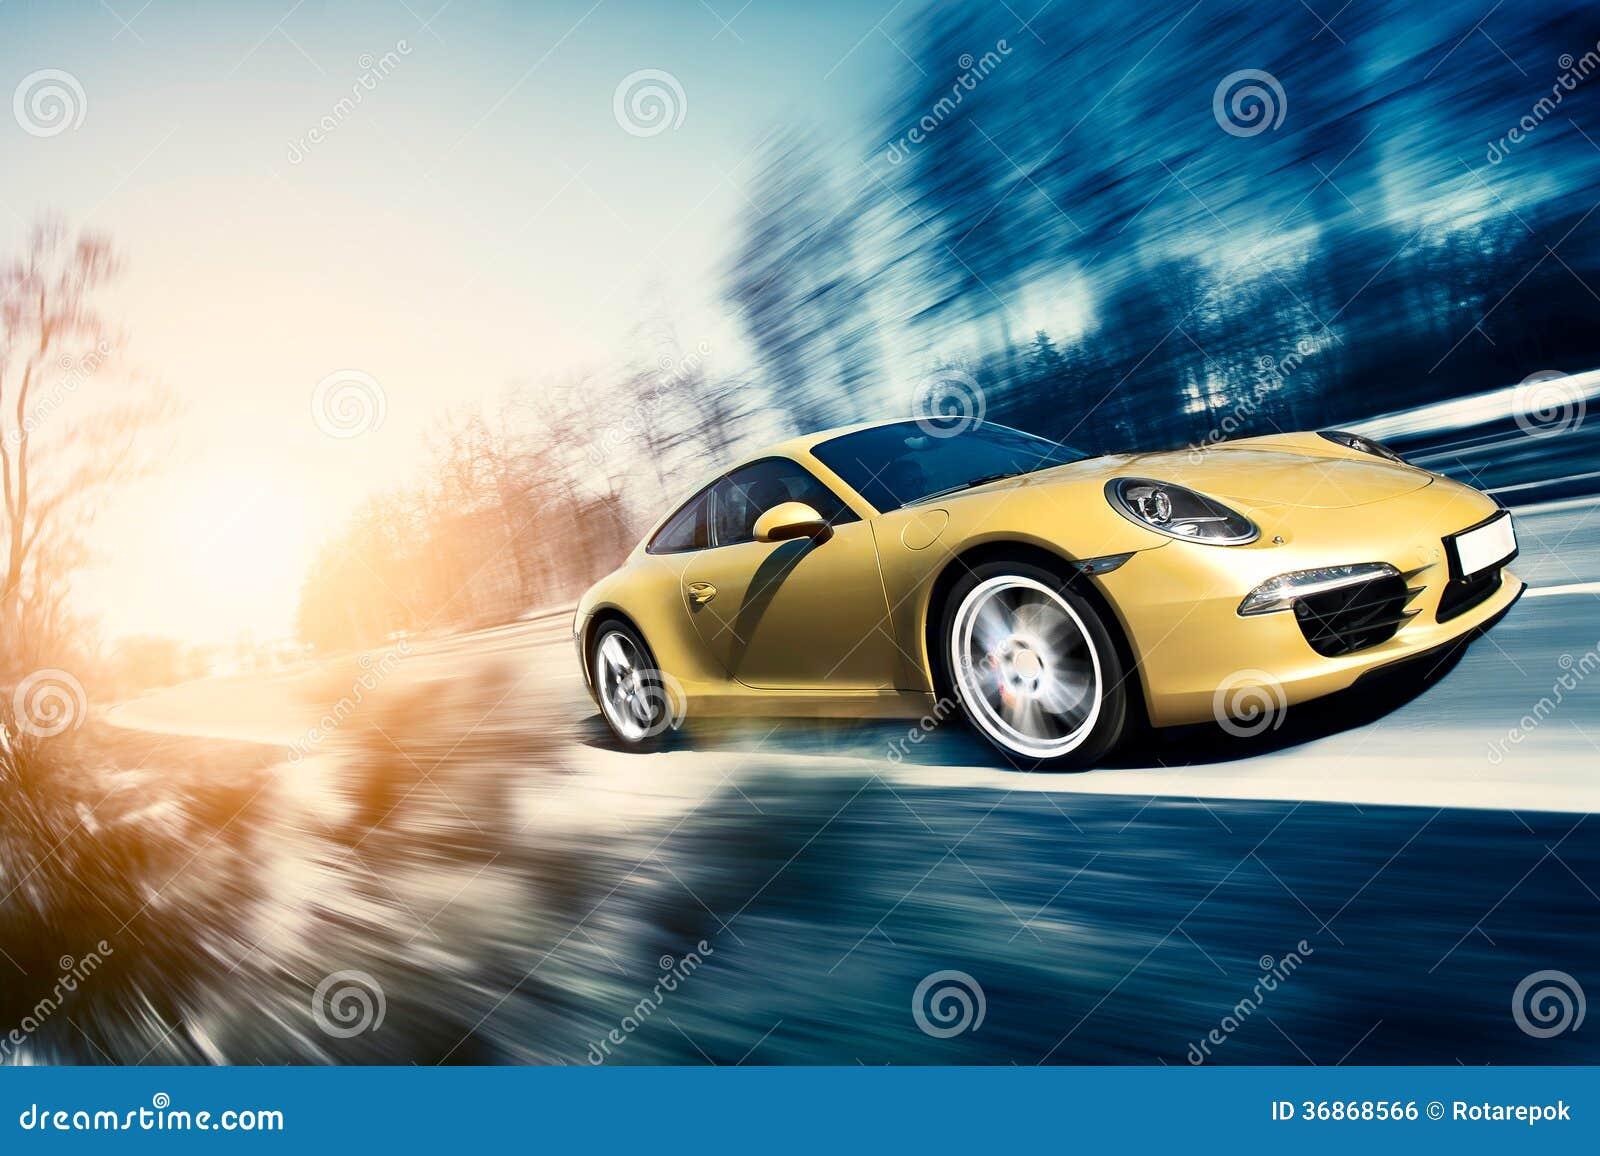 Moving sport car